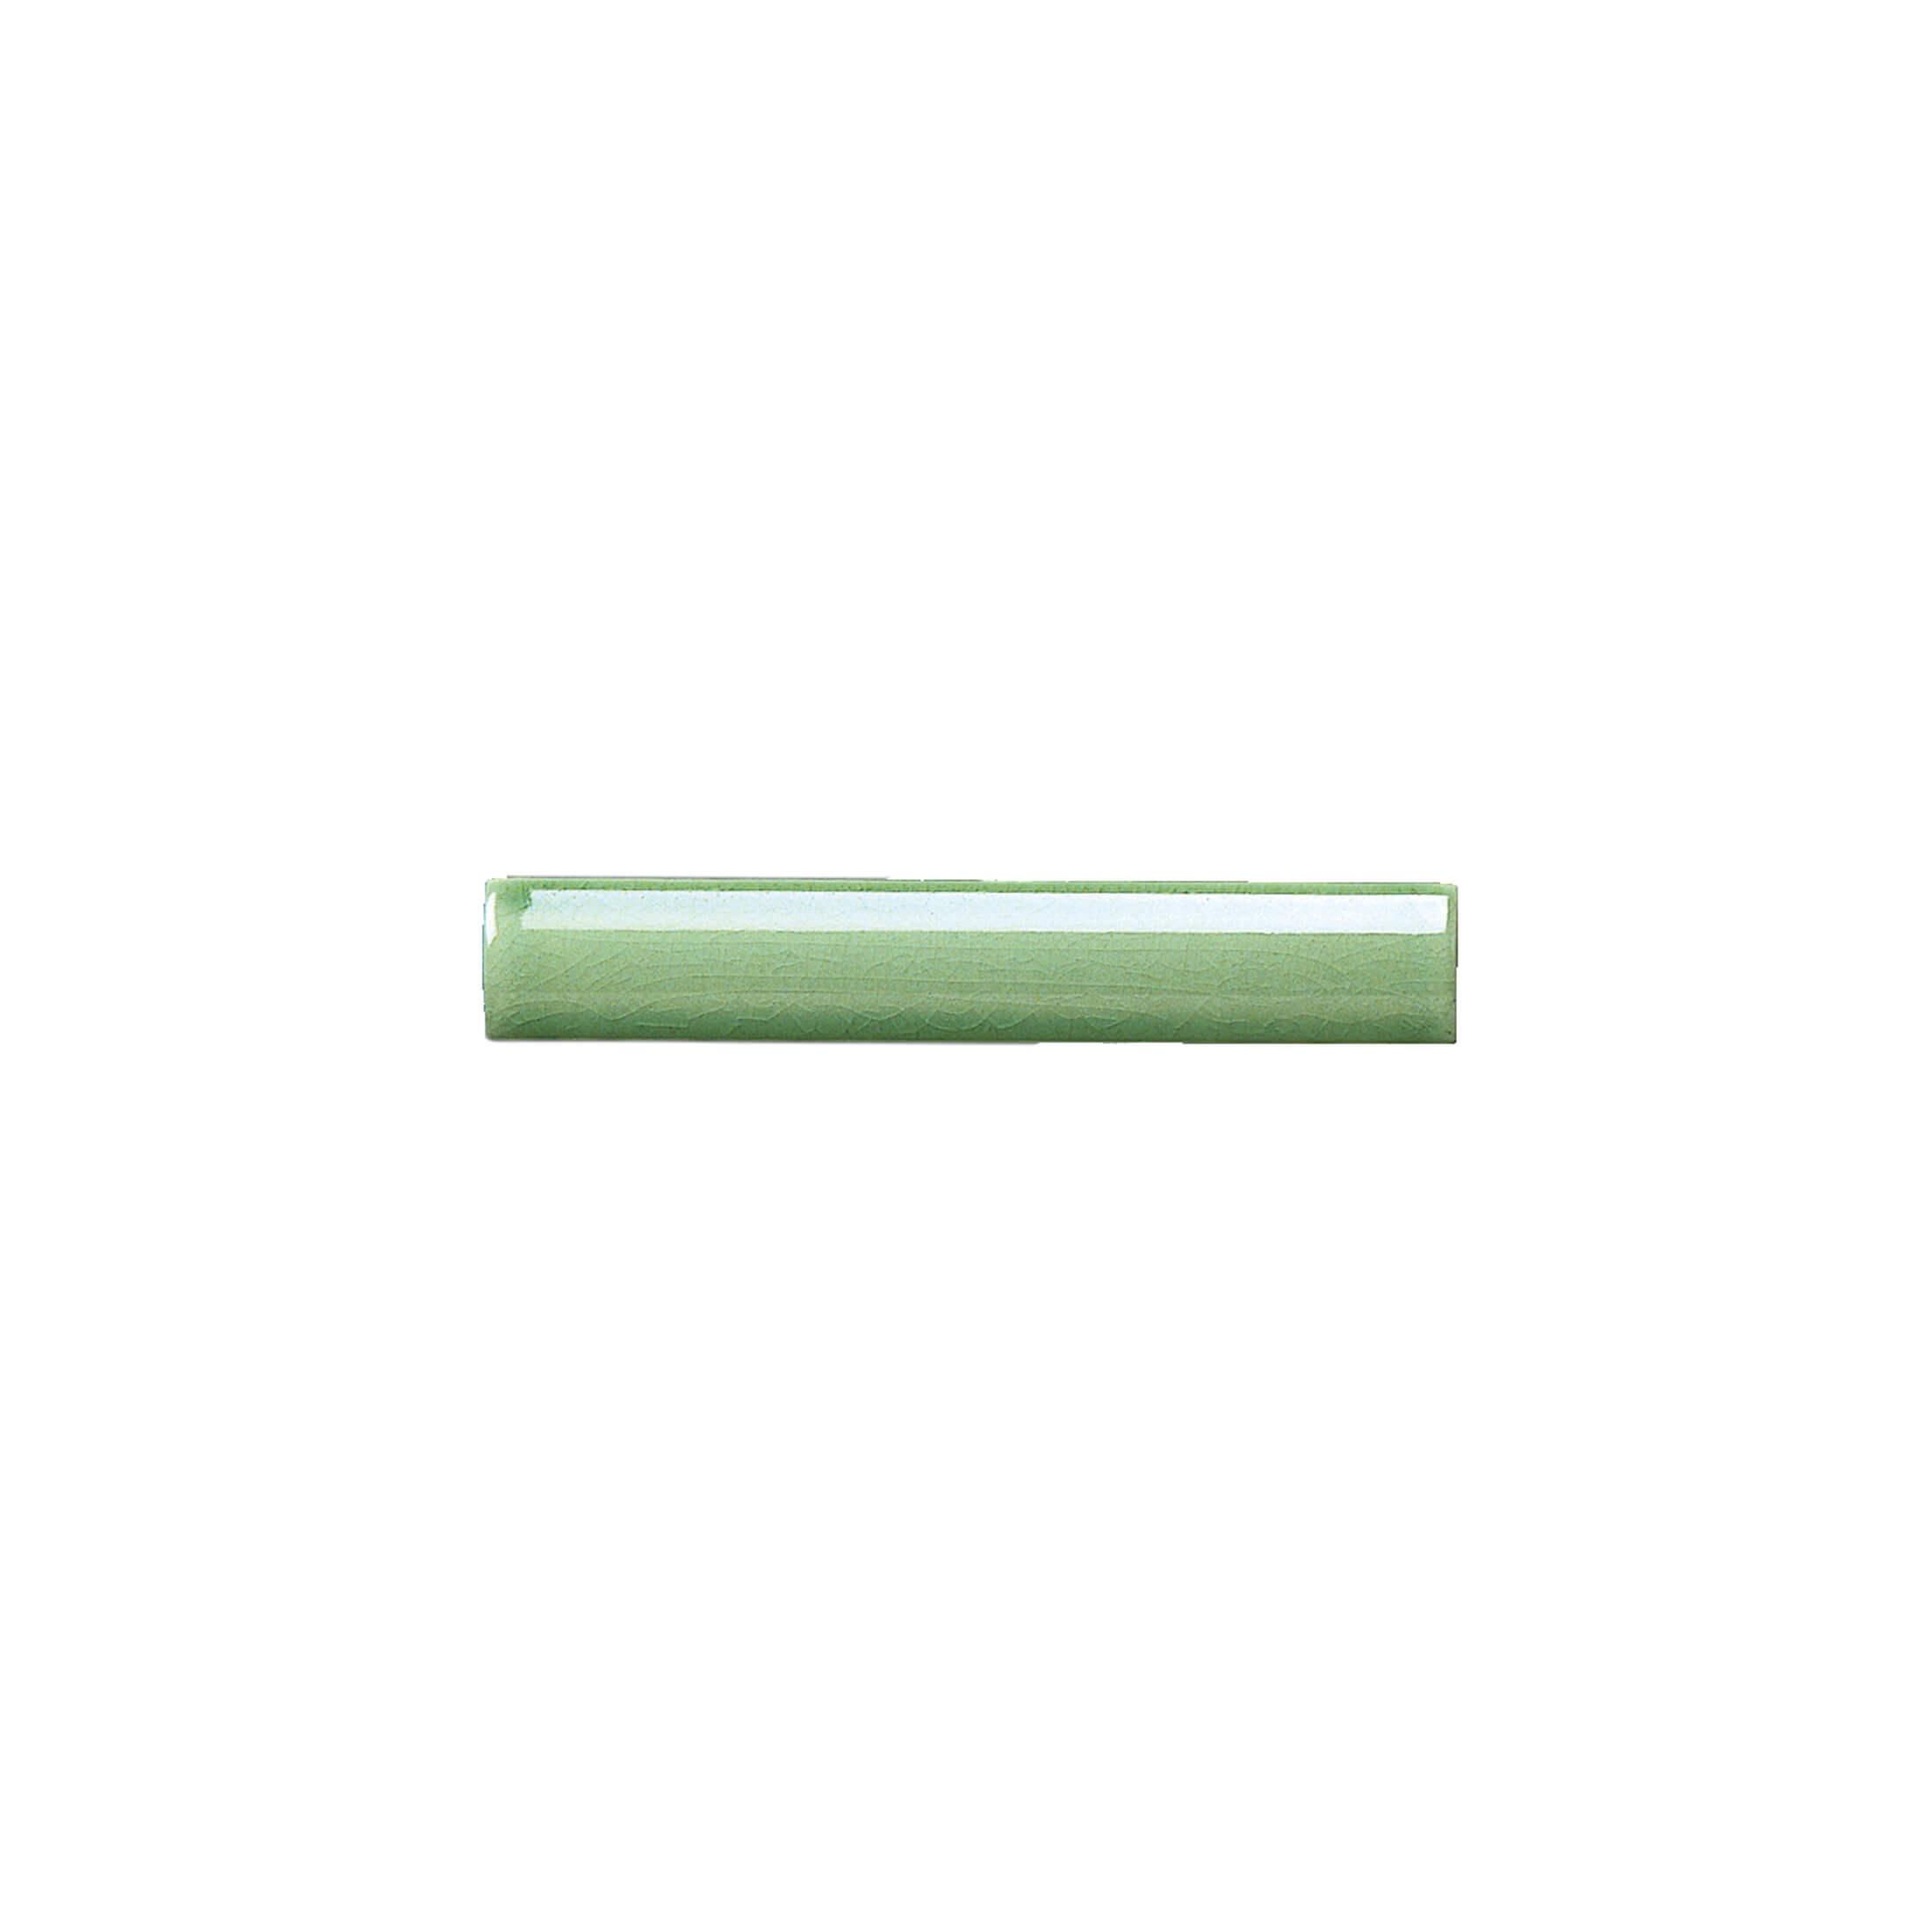 ADMO5179 - CUBRECANTO PB C/C - 2.5 cm X 15 cm